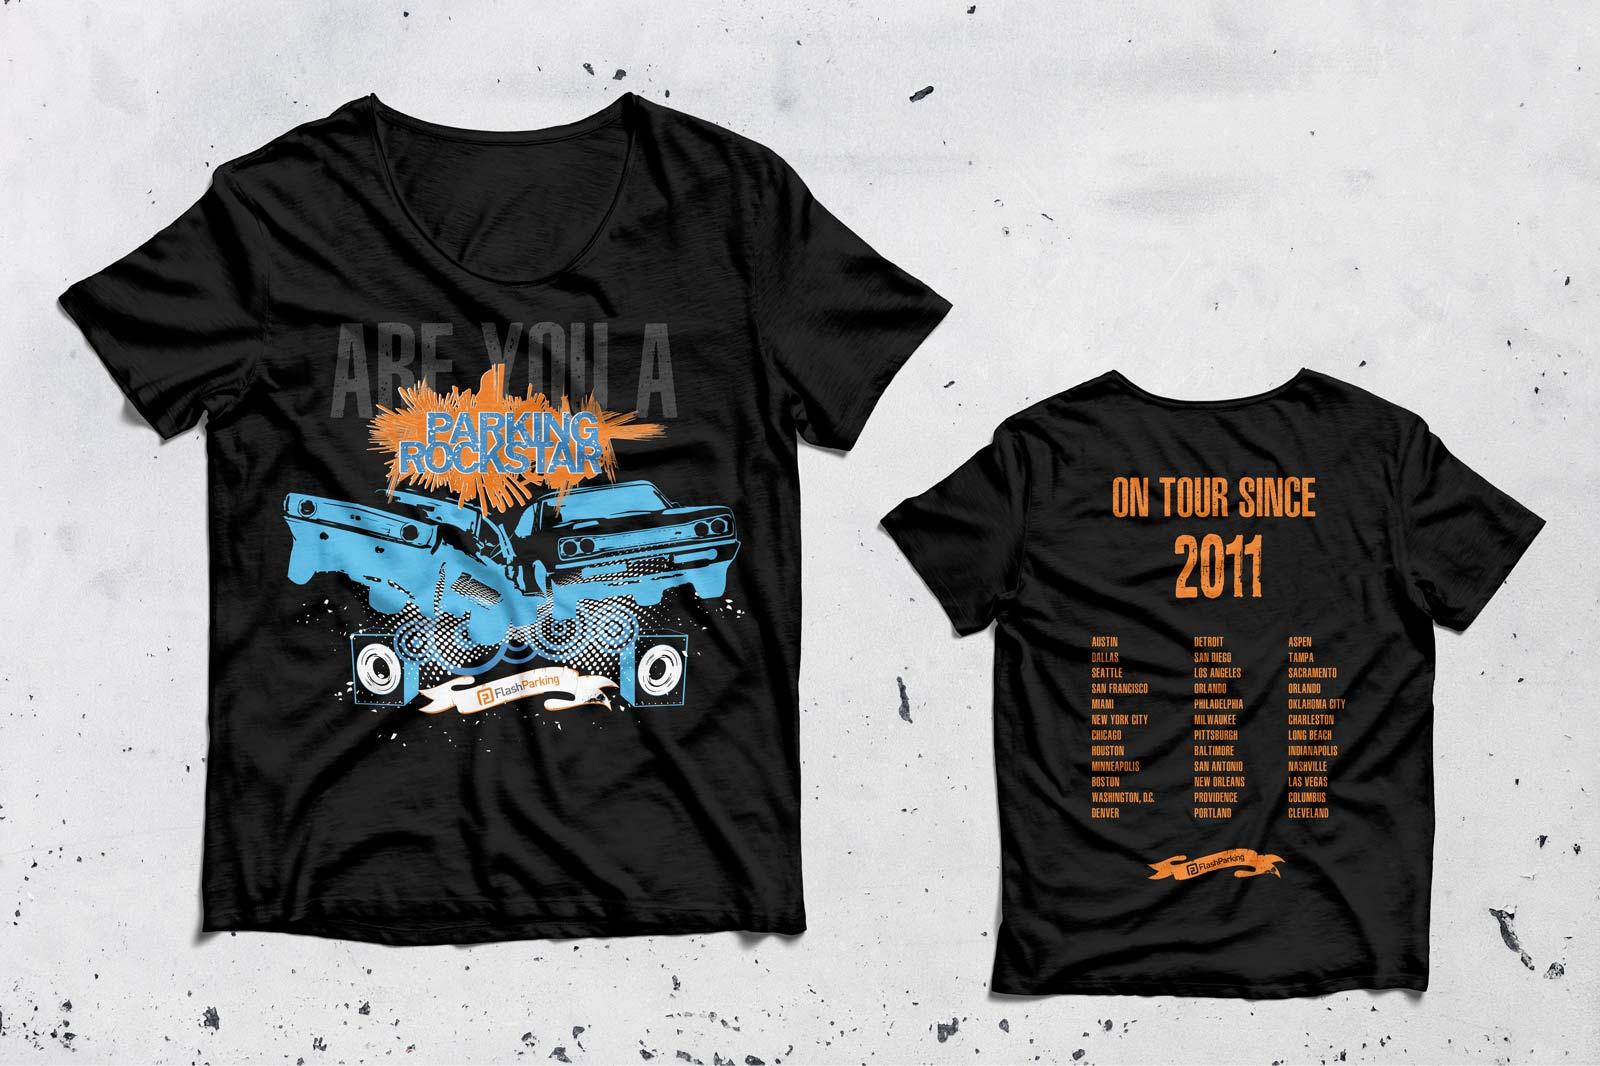 parking rockstar tee shirt designs front and back